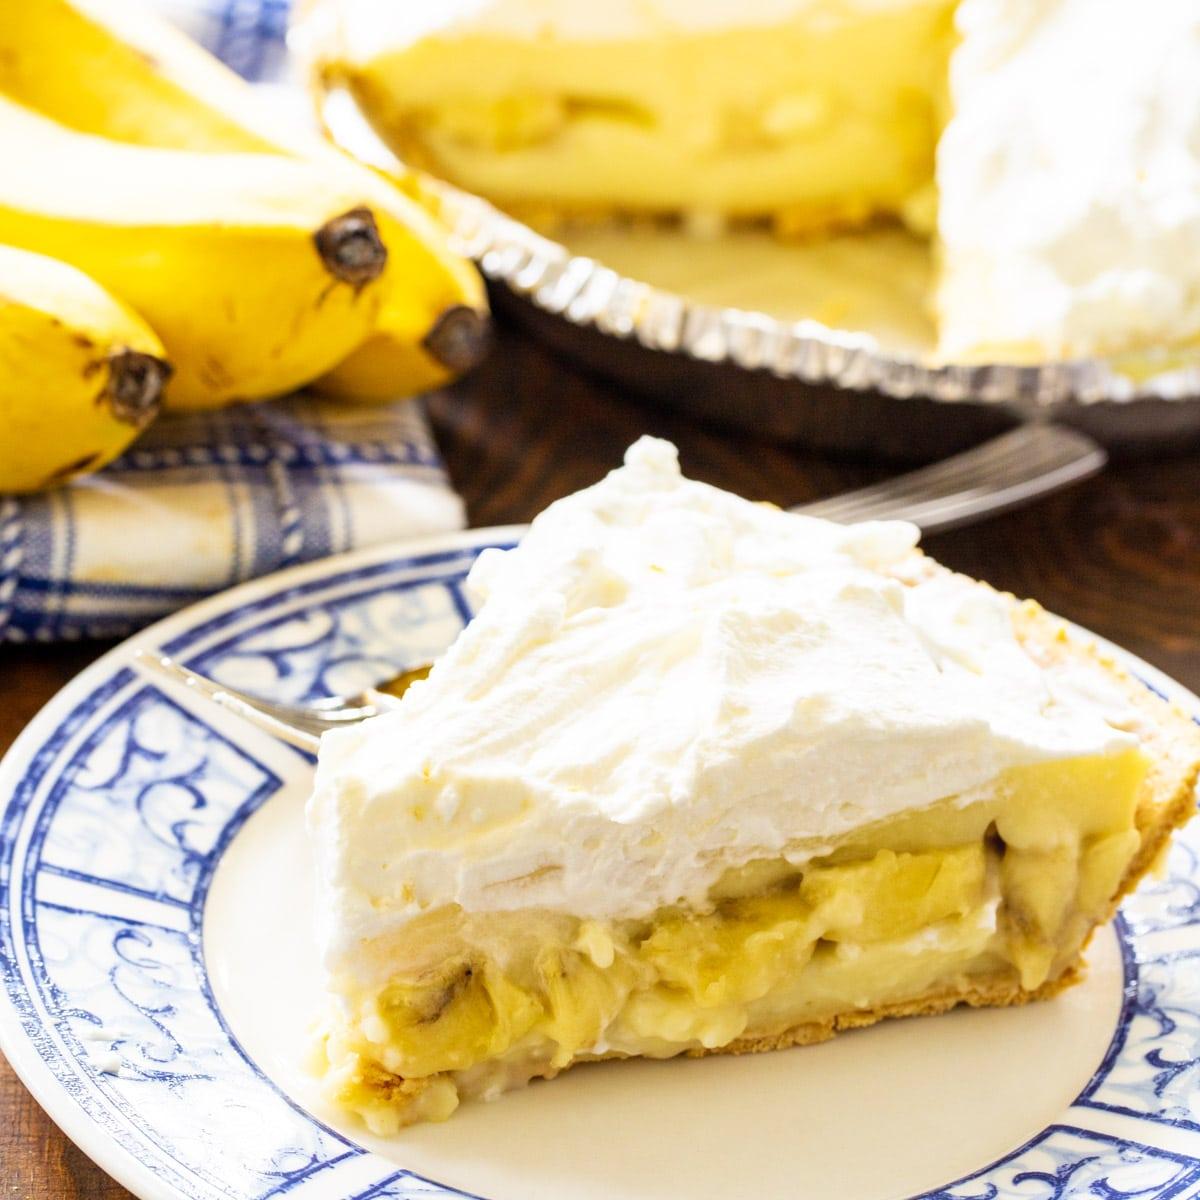 Slice of Banana Cream Pie on a plate.